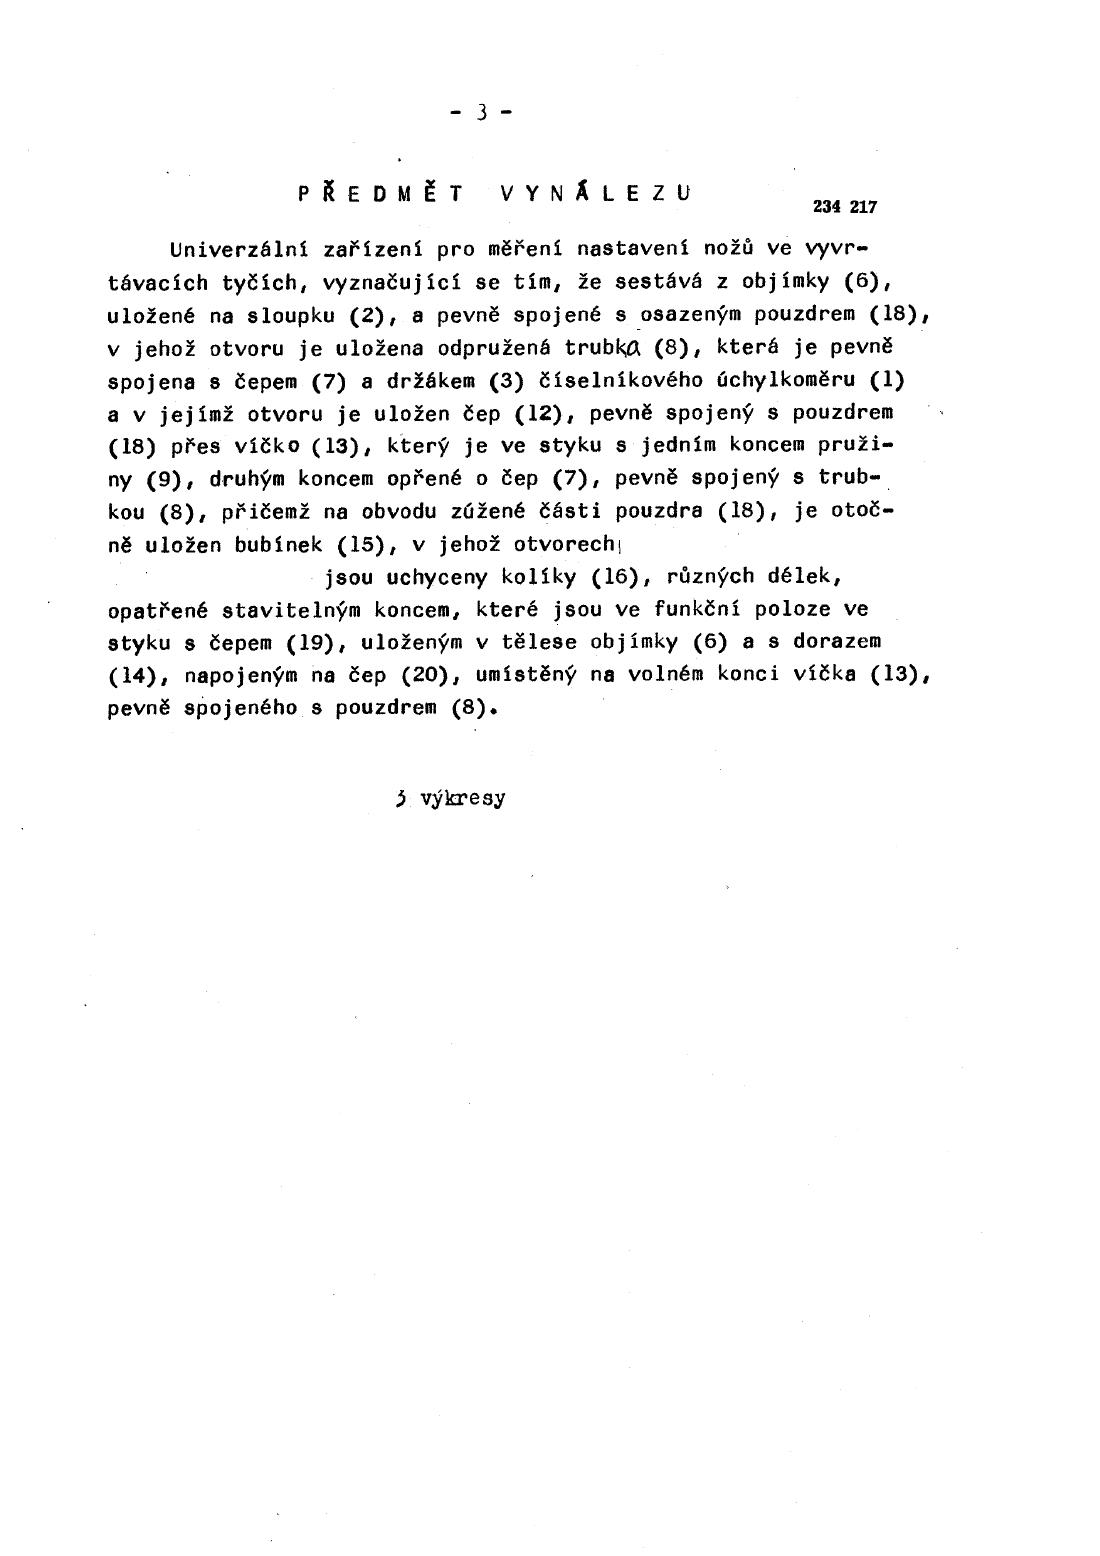 Univerzalni Zarizeni Pro Mereni Nastaveni Nozu Ve Vyvrtavacich